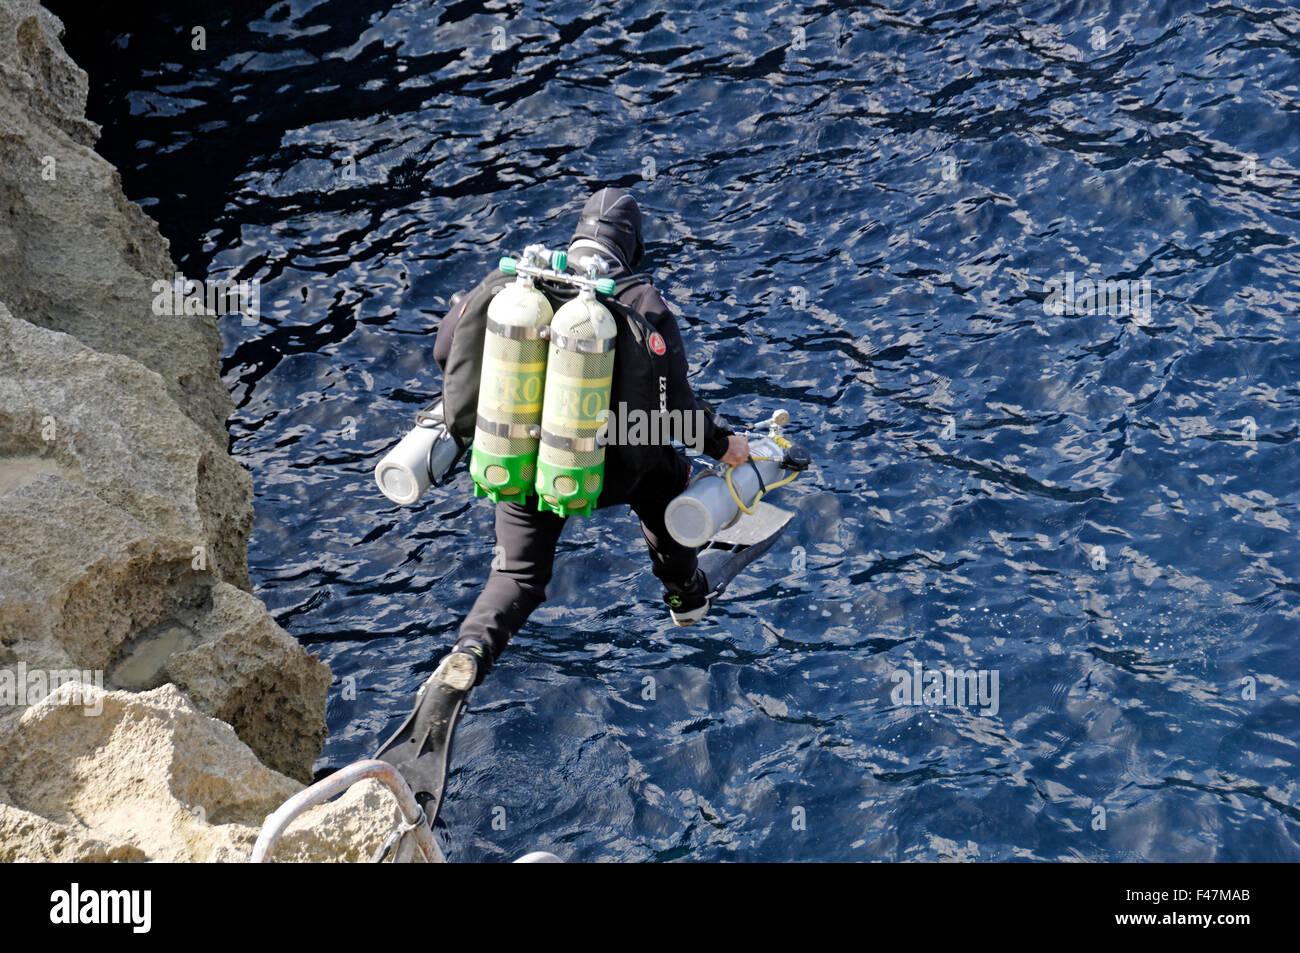 Tri Mix Scuba Diving : Technical trimix scuba diver gozo malta south europe